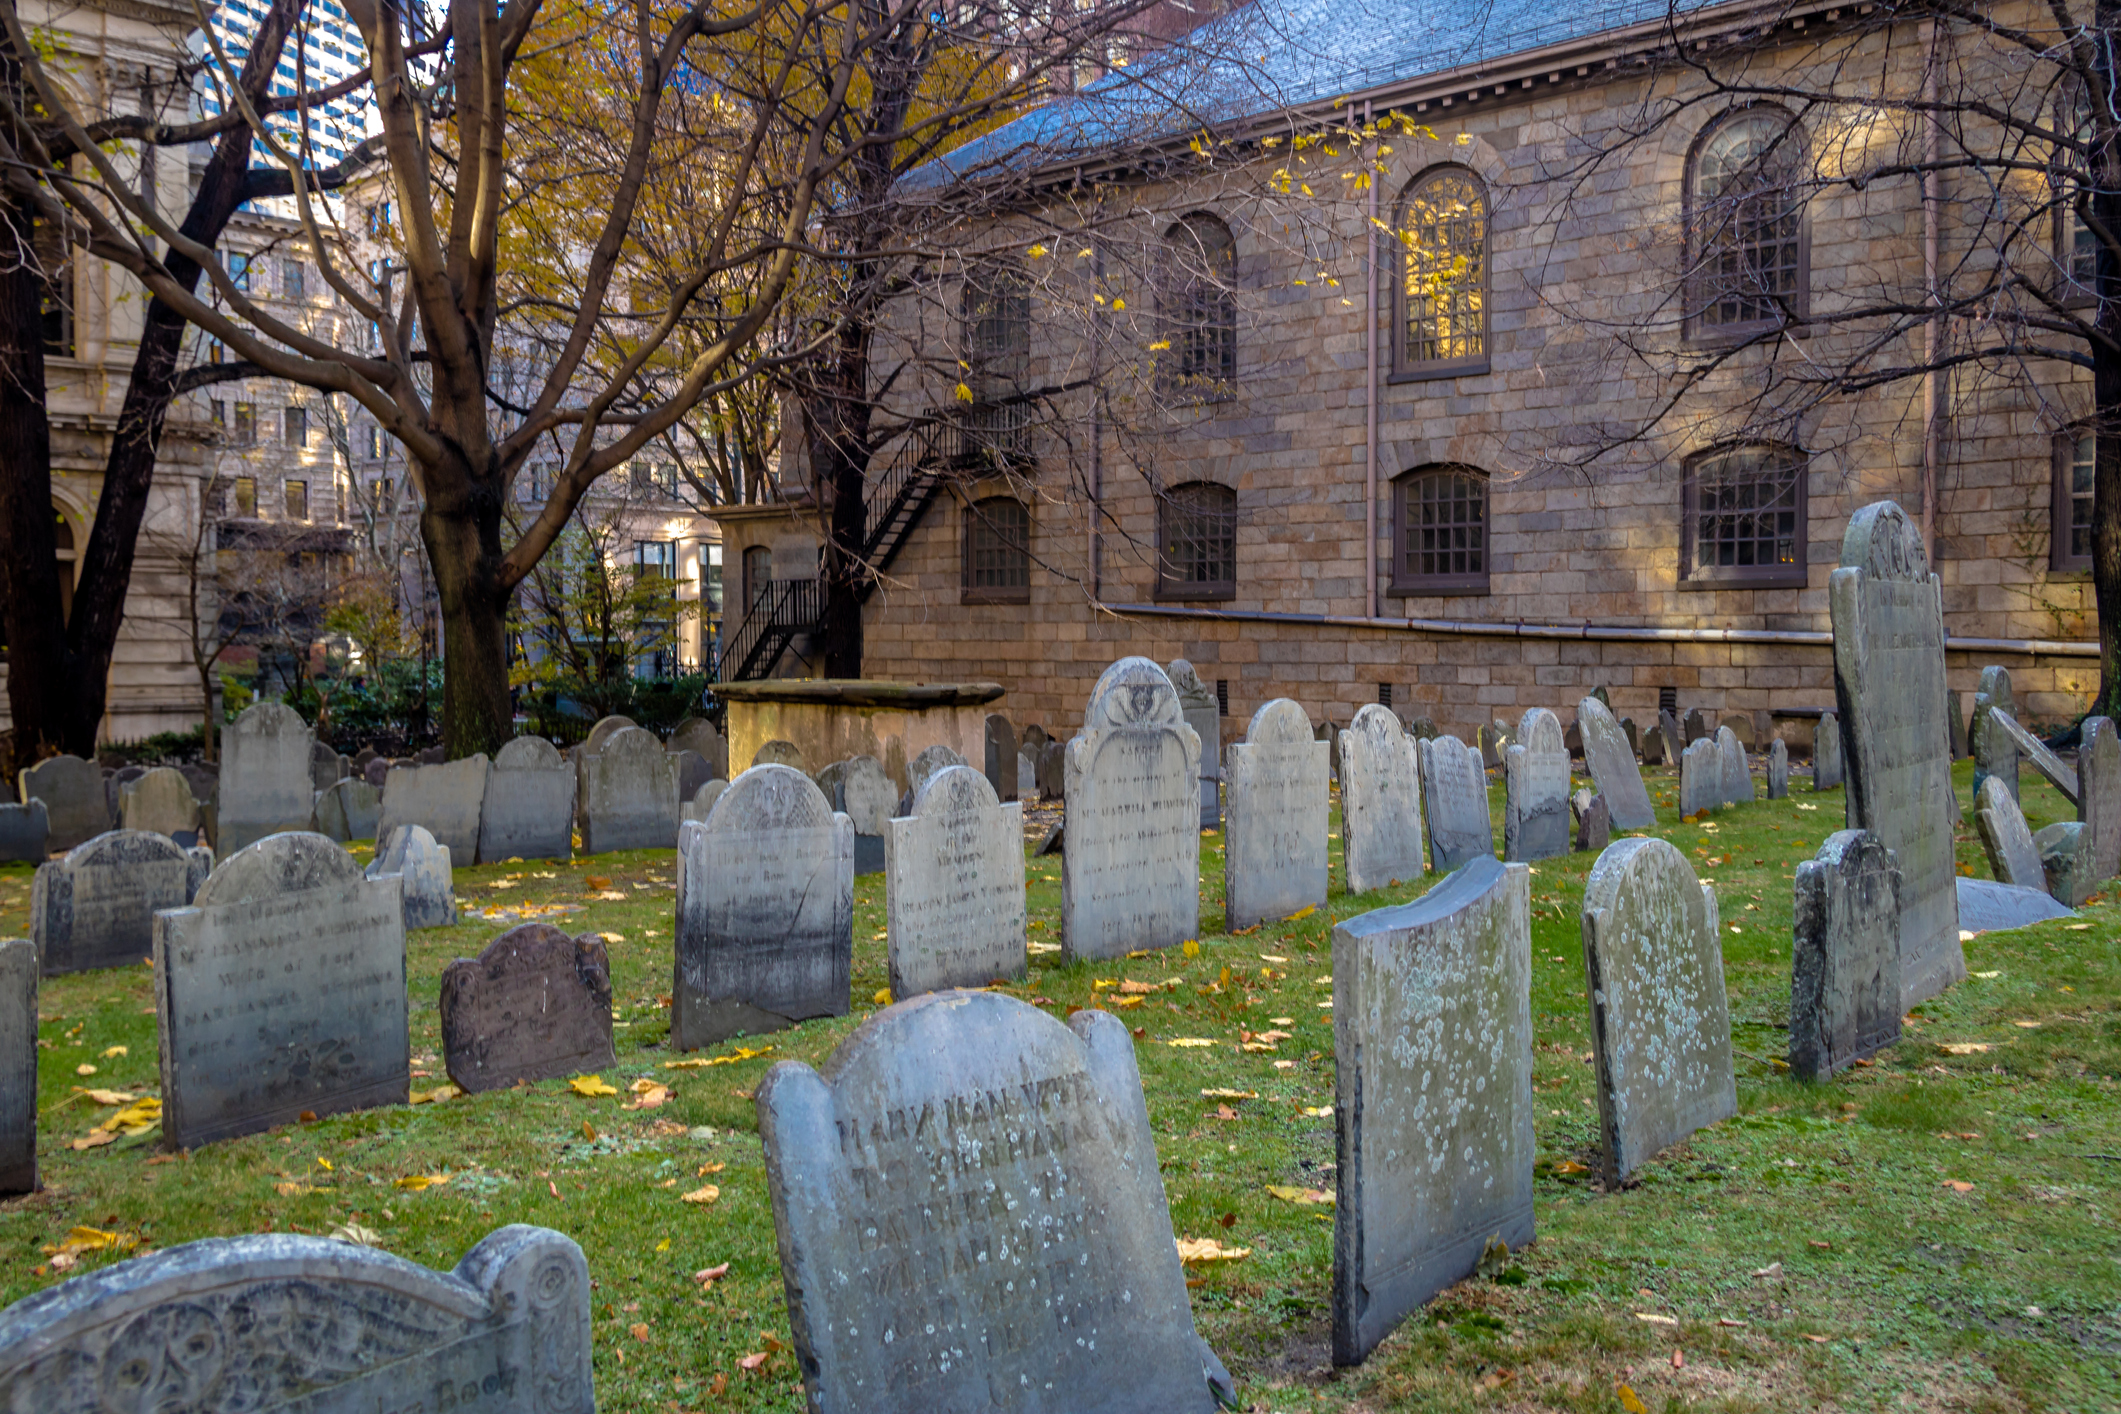 King's Chapel Burying Ground